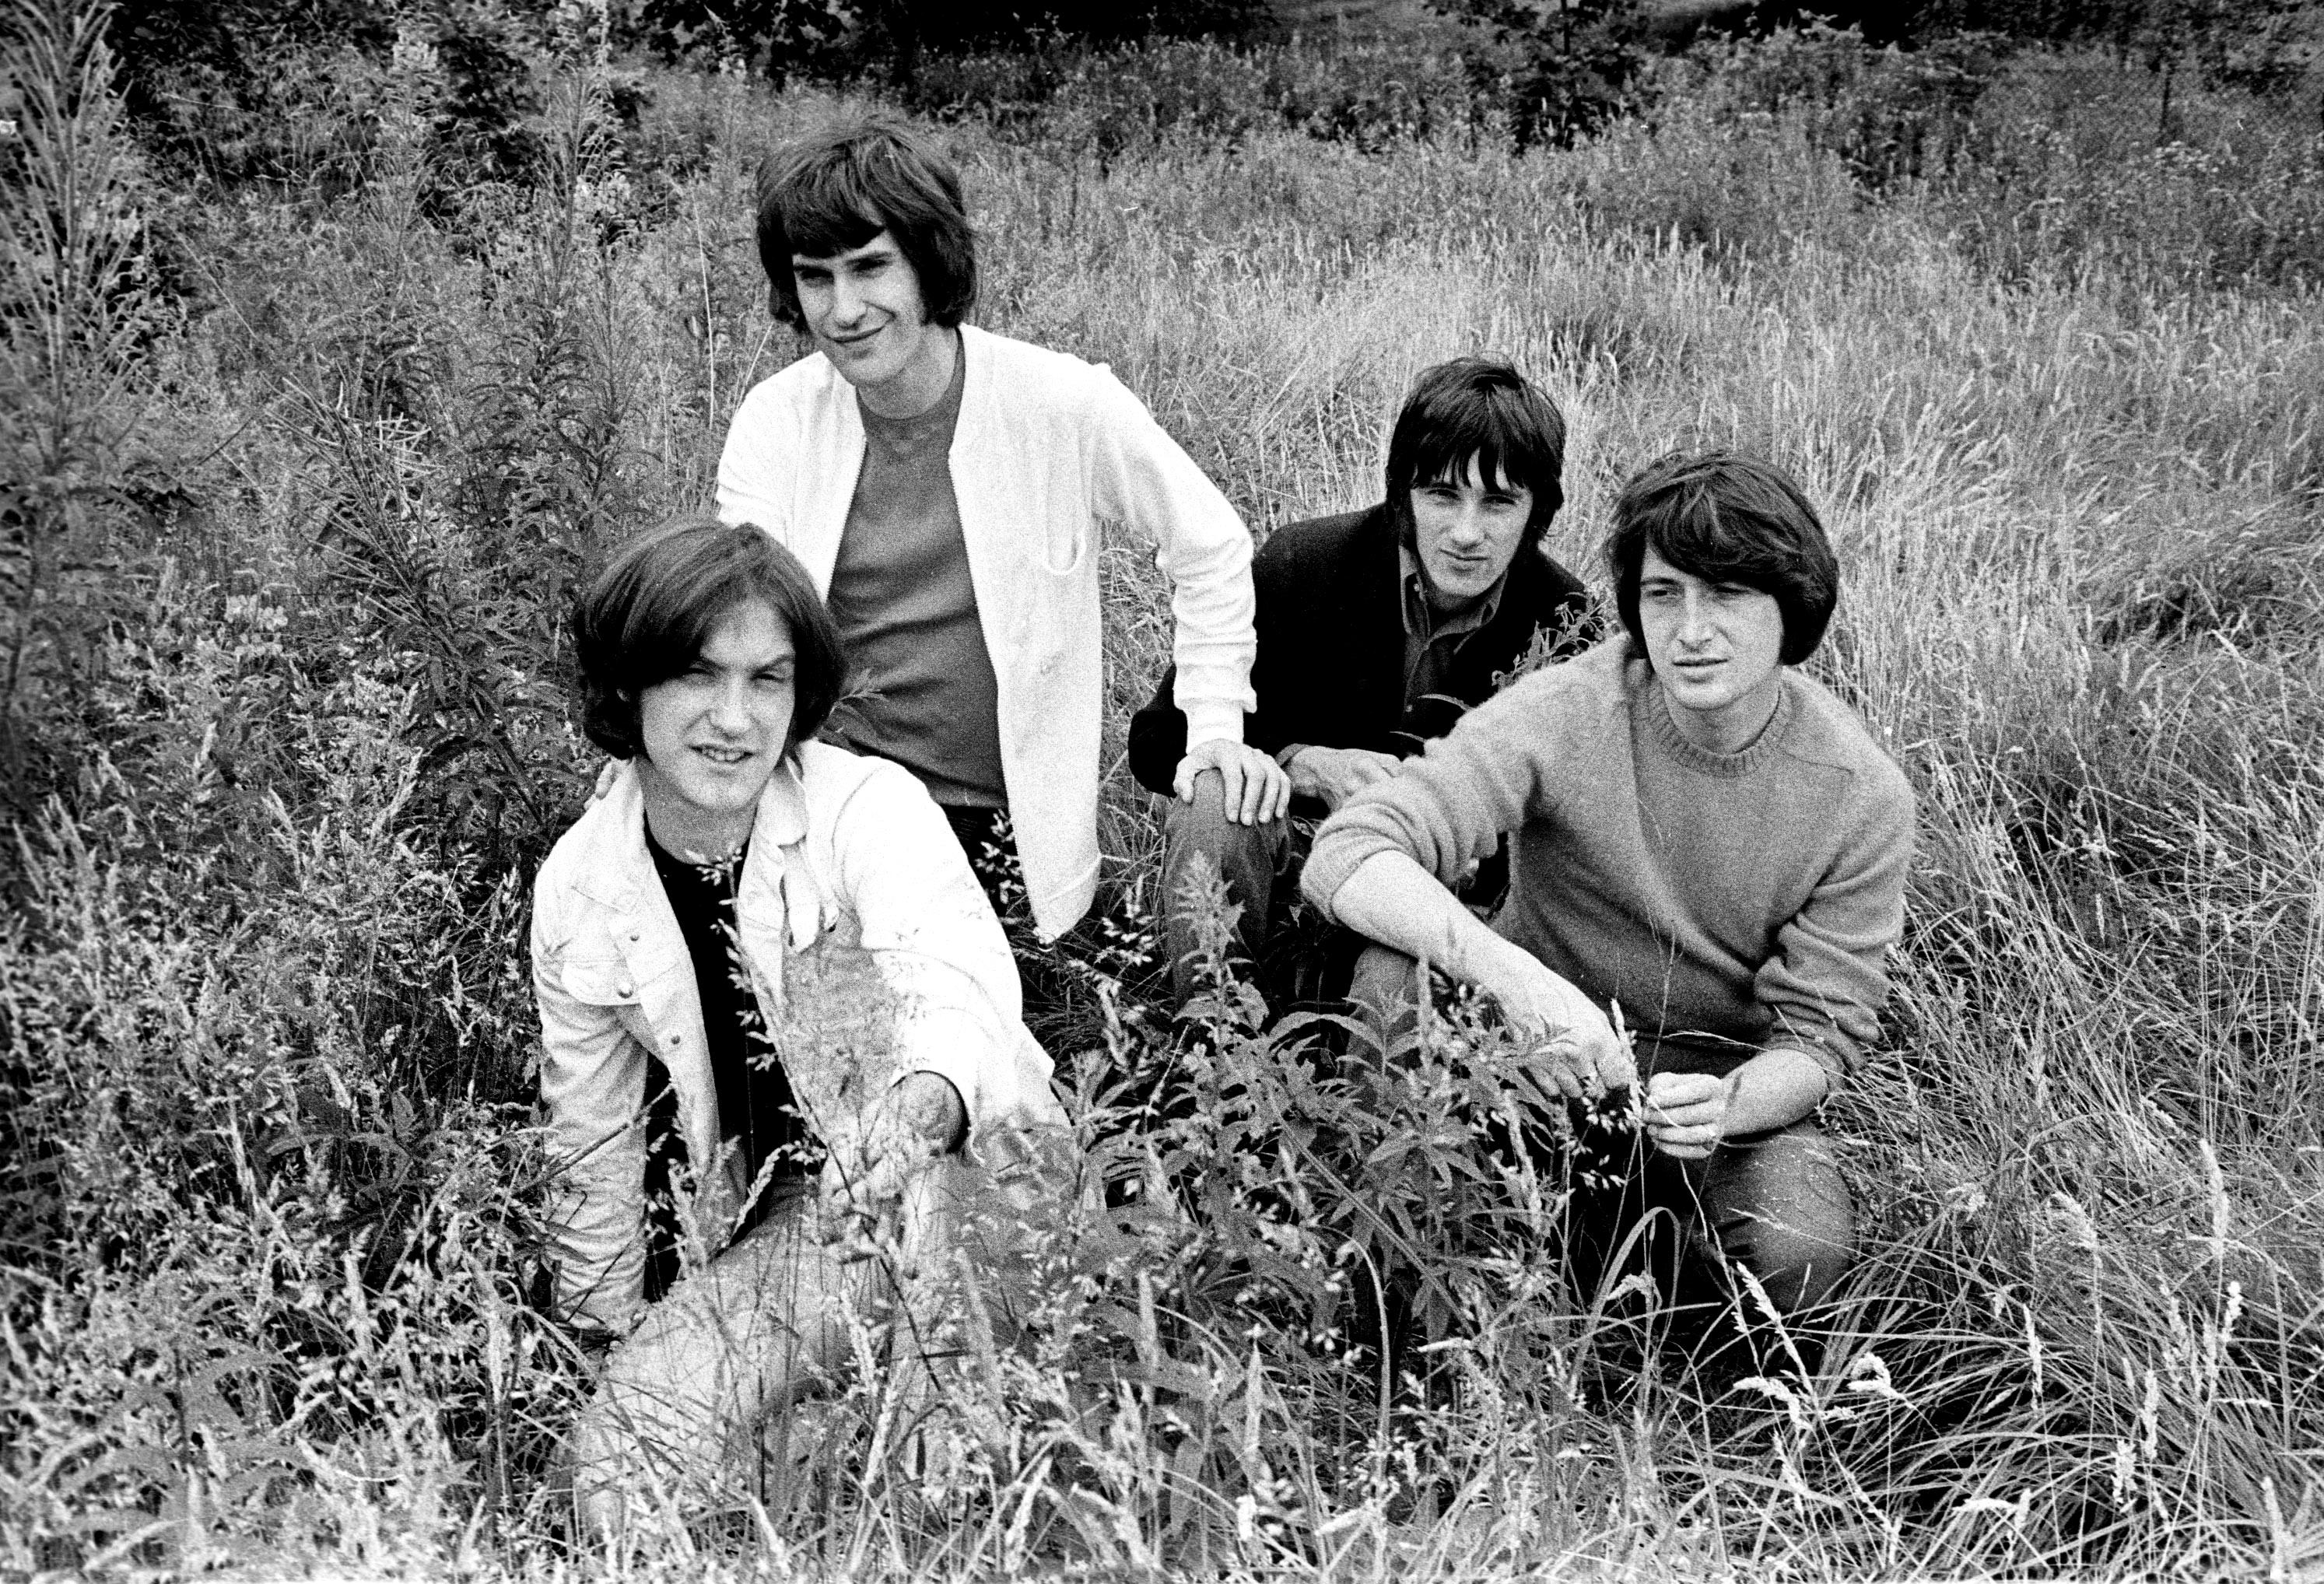 140._The_Kinks_1968